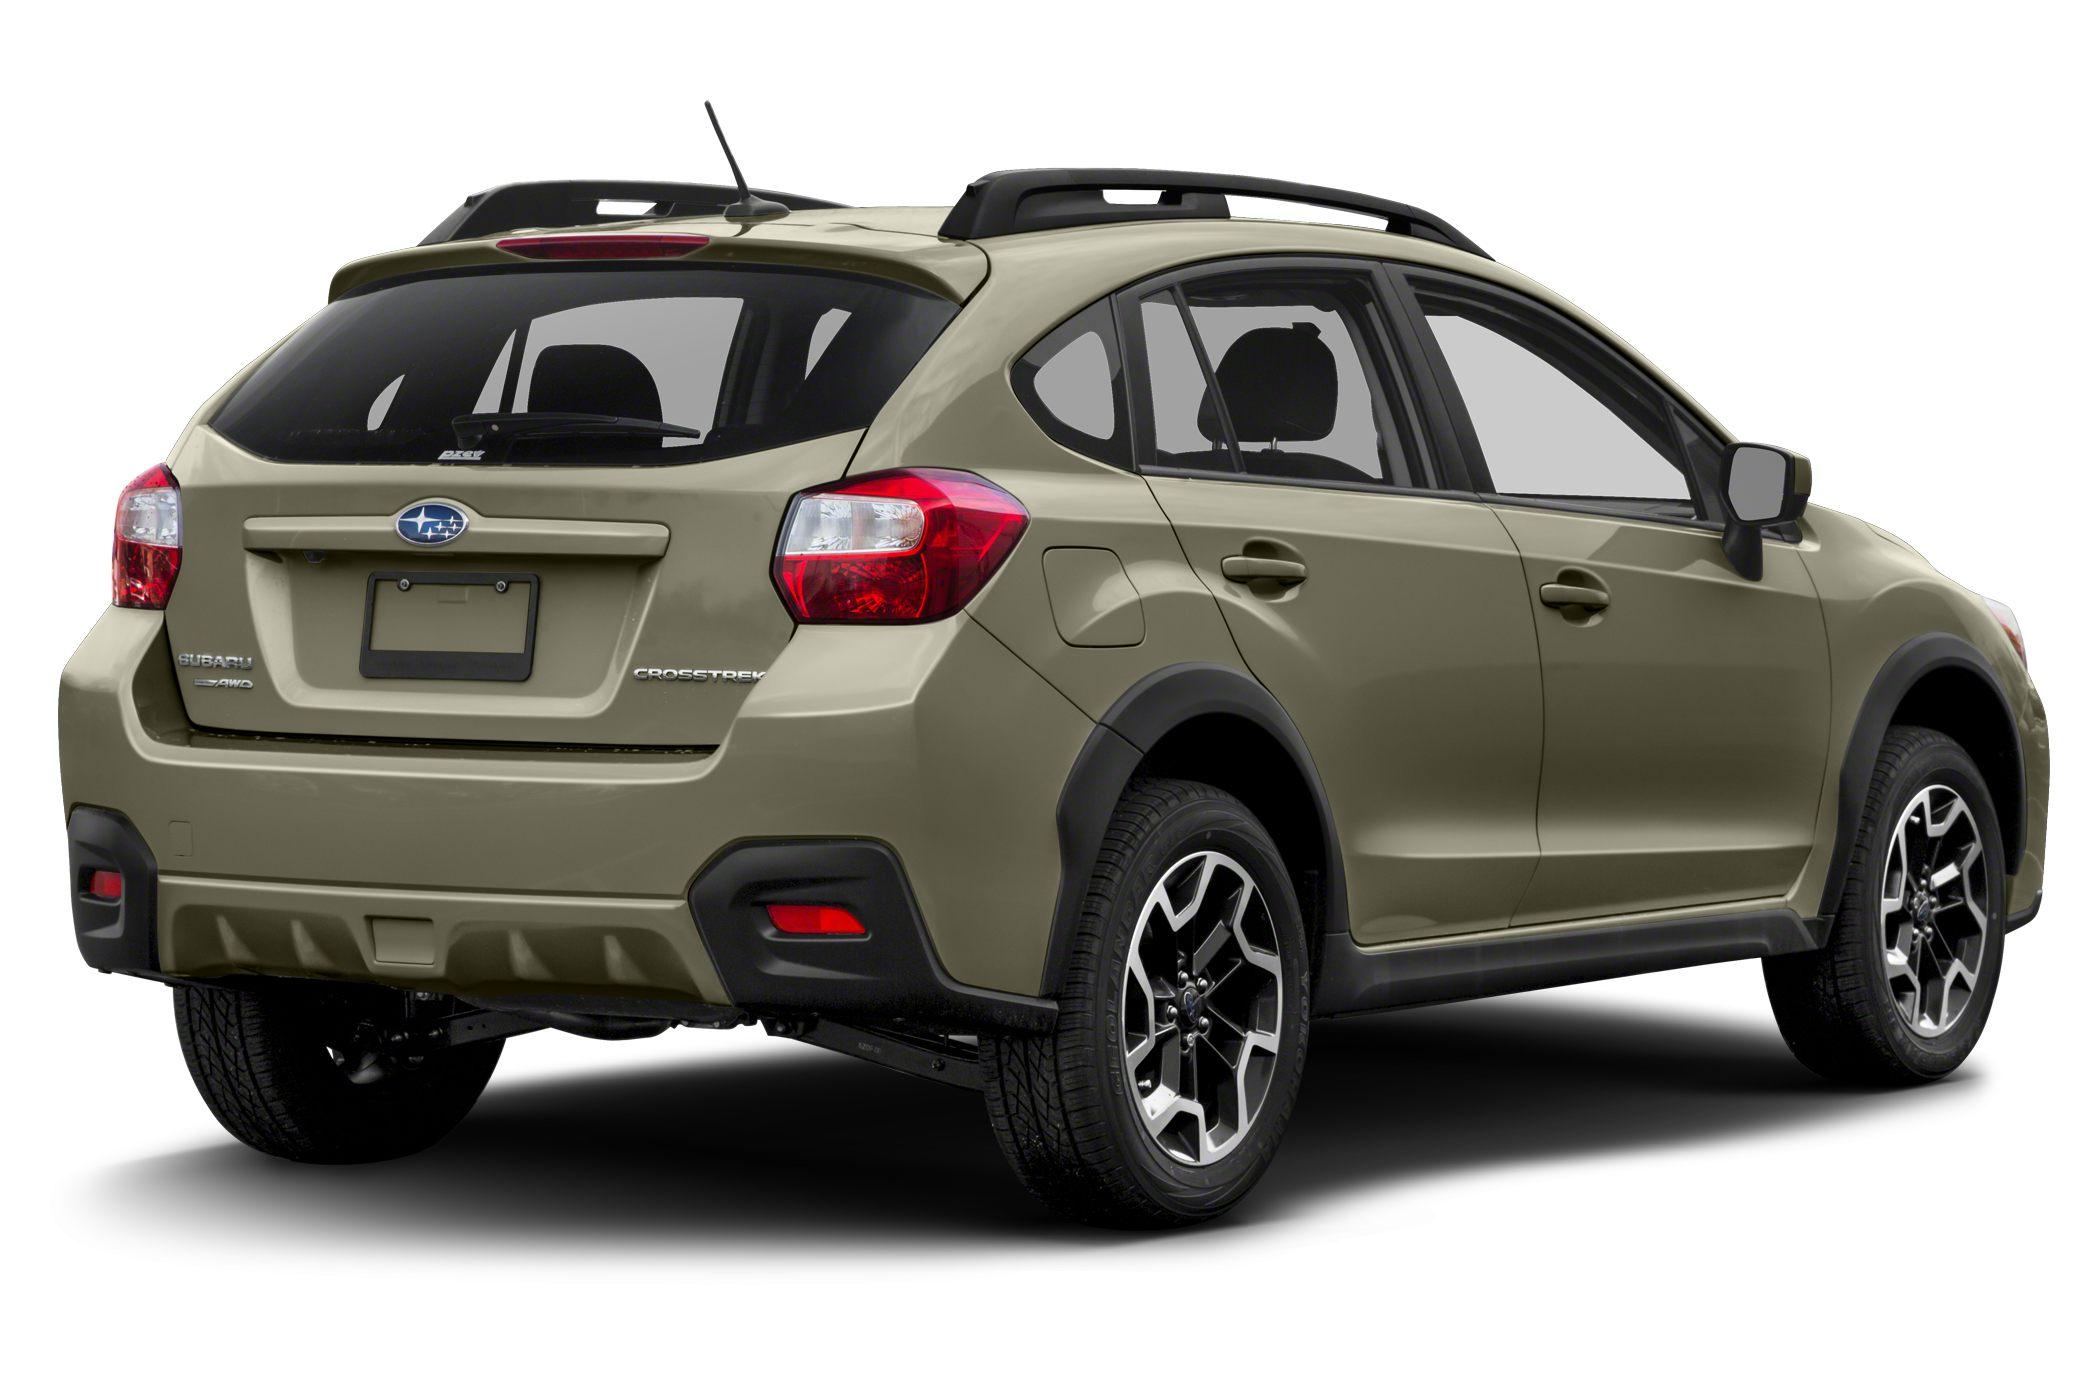 2017 Crosstrek Limited >> 2017 Subaru Crosstrek Reviews, Specs and Prices | Cars.com